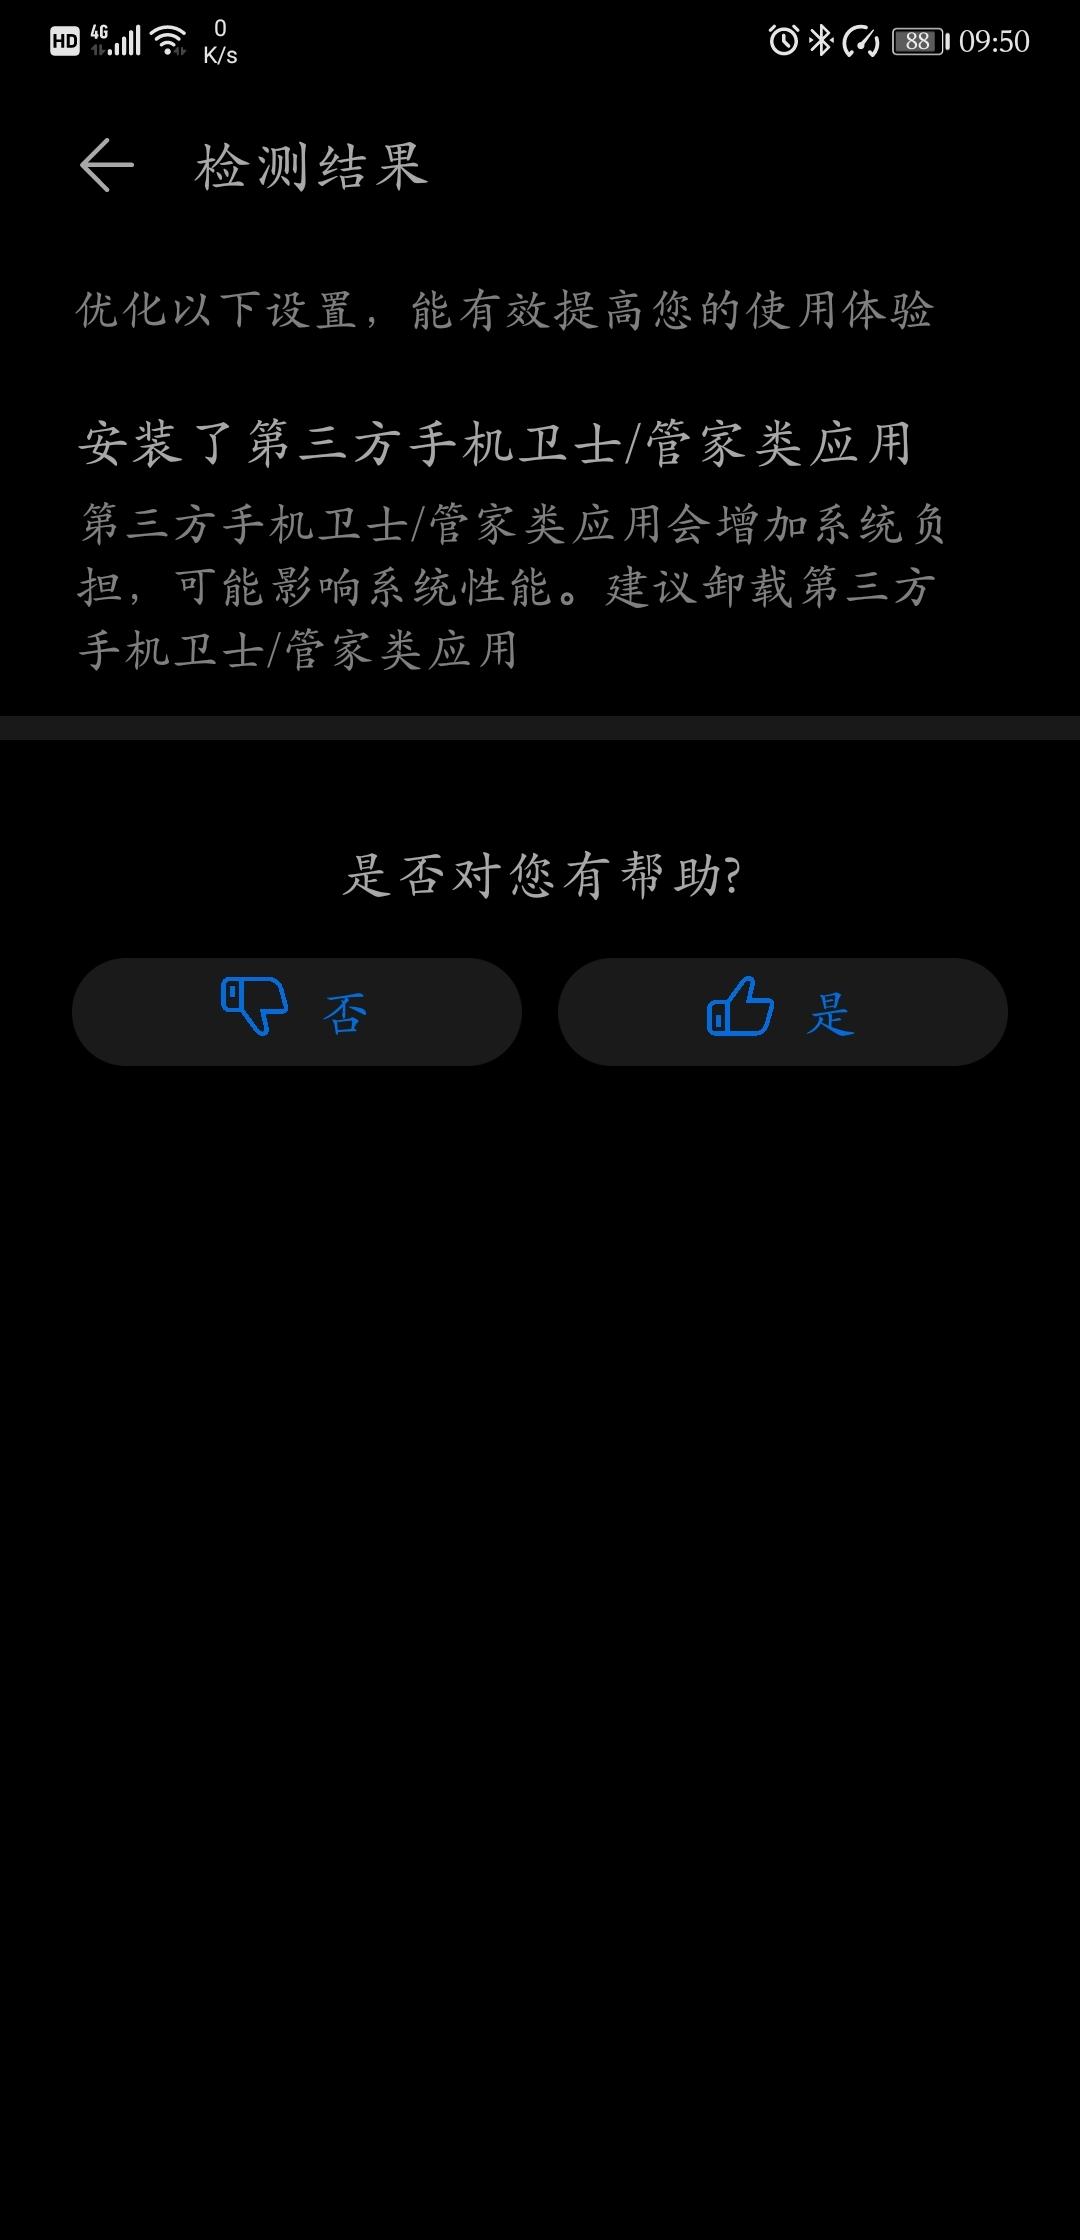 Screenshot_20200516_095033_com.huawei.hwdetectrepair.jpg